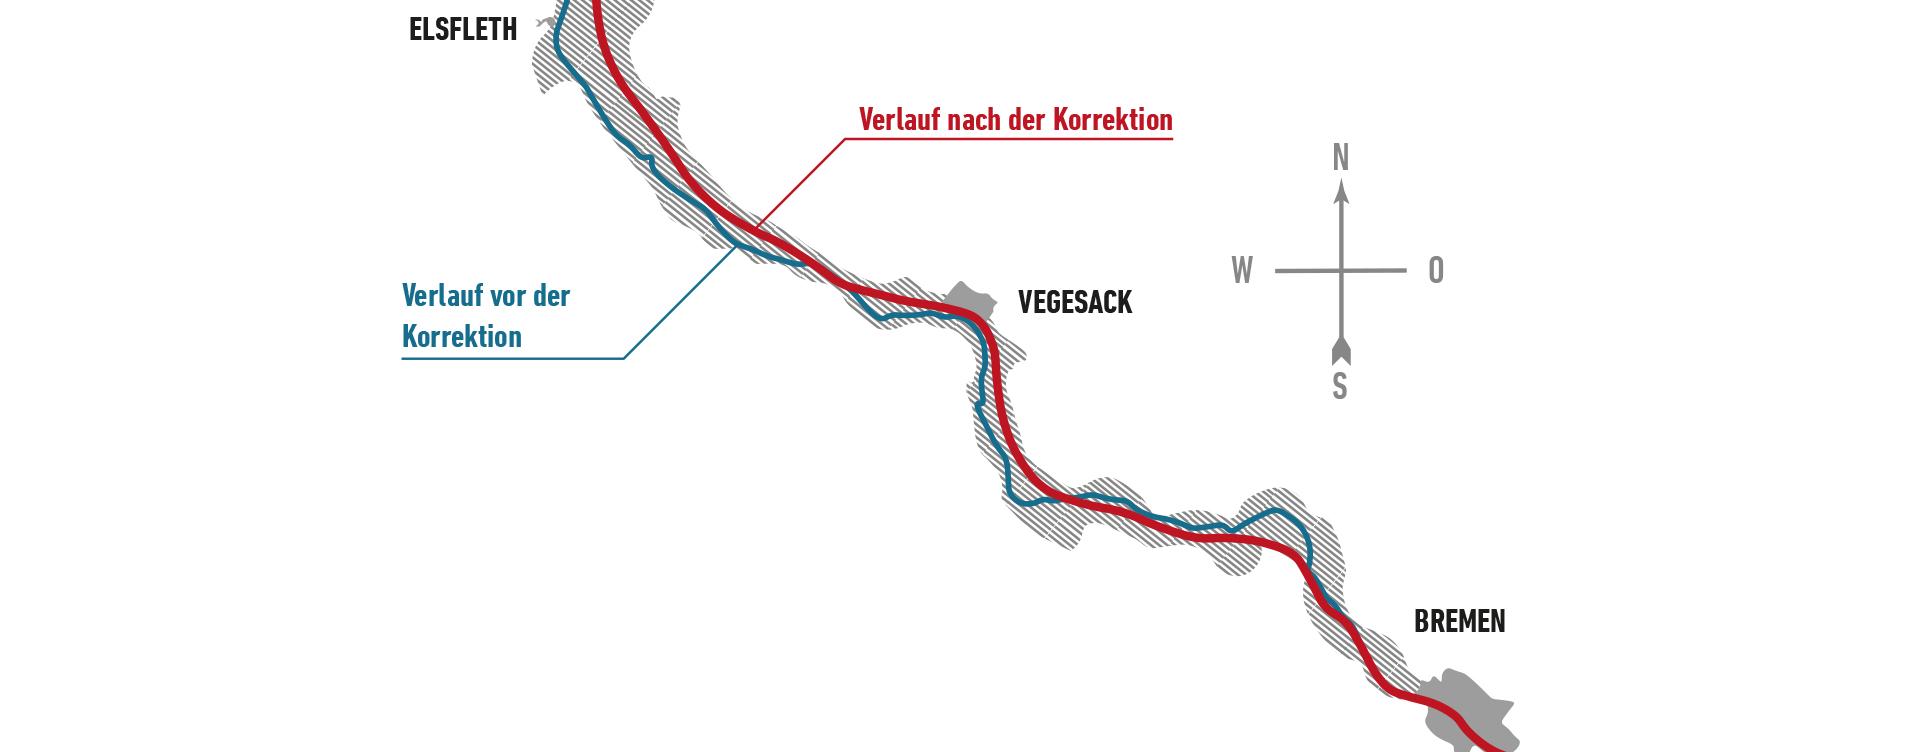 Weserkorrektion